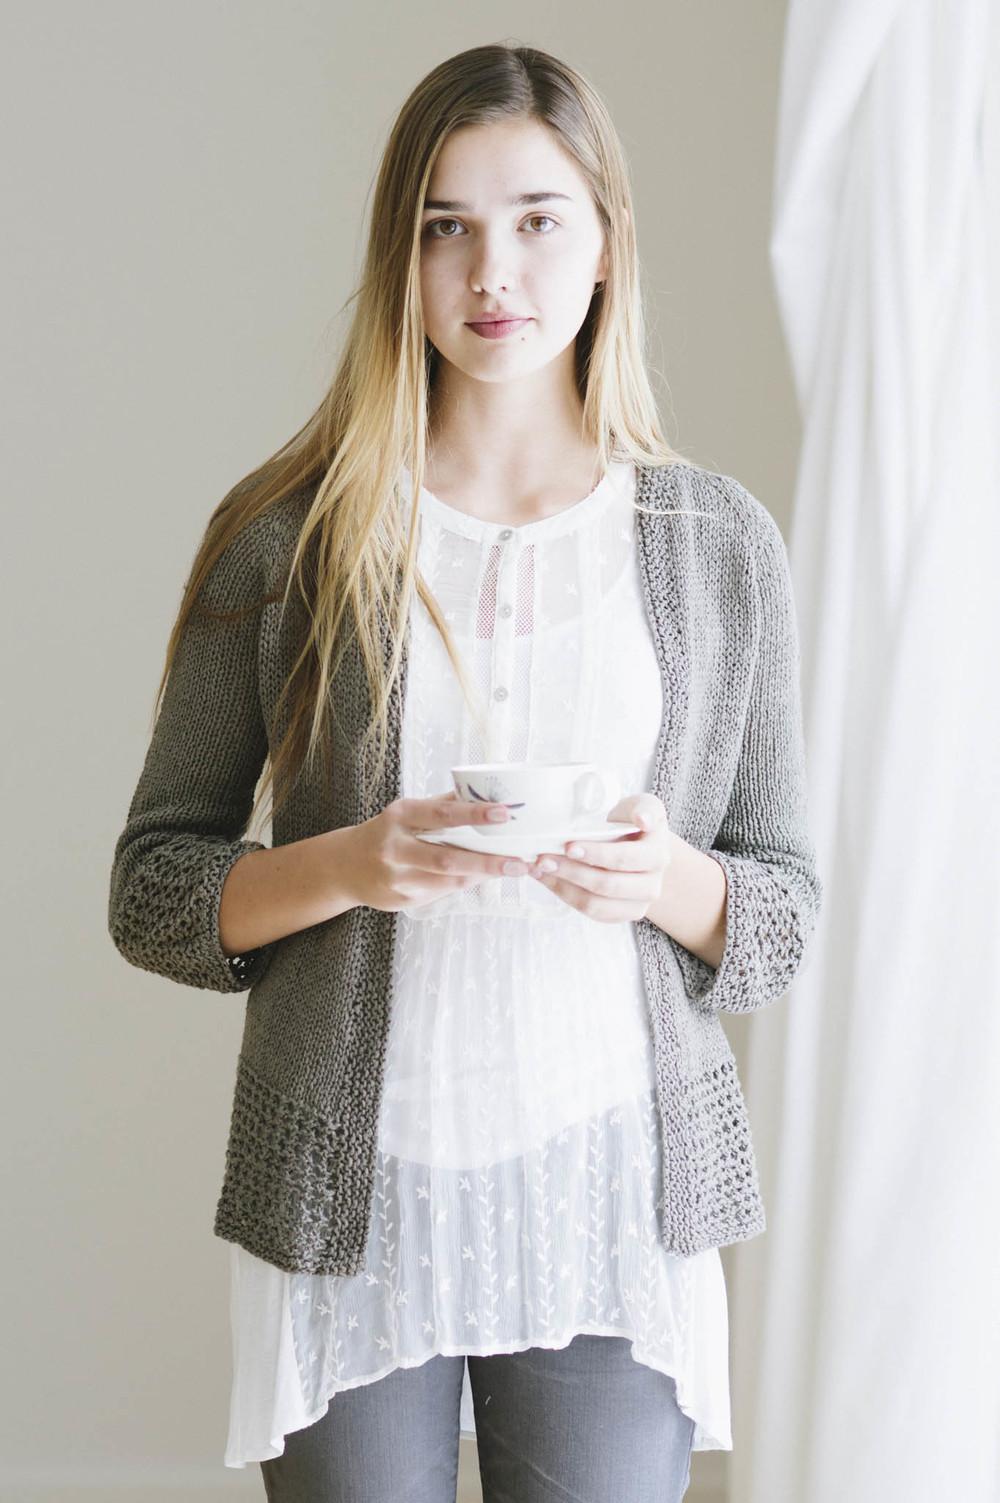 quince-co-jessamin-melissa-labarre-knitting-pattern-kestrel-1.jpg